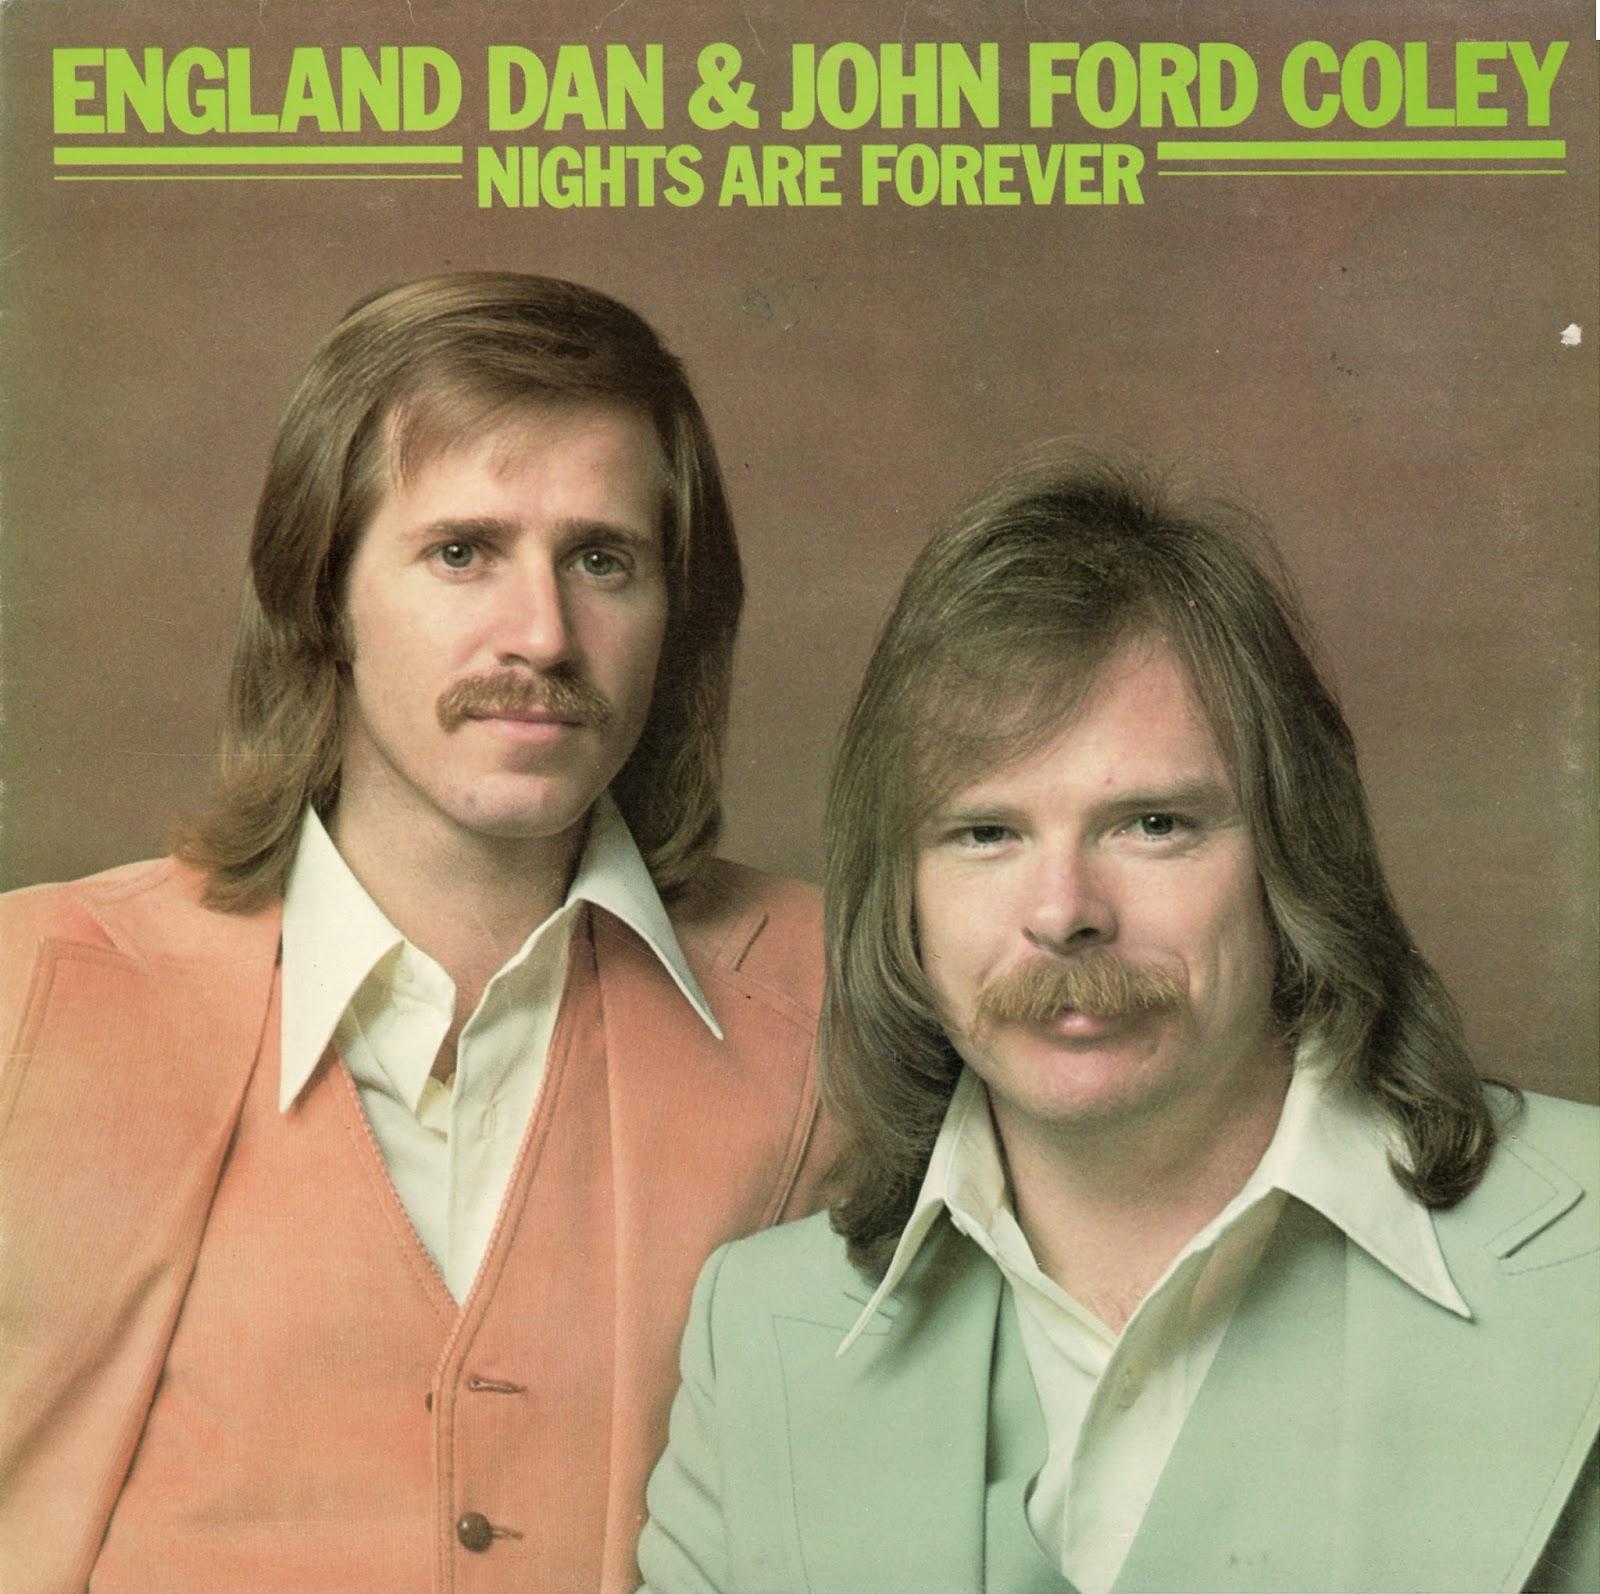 England dan john ford coley